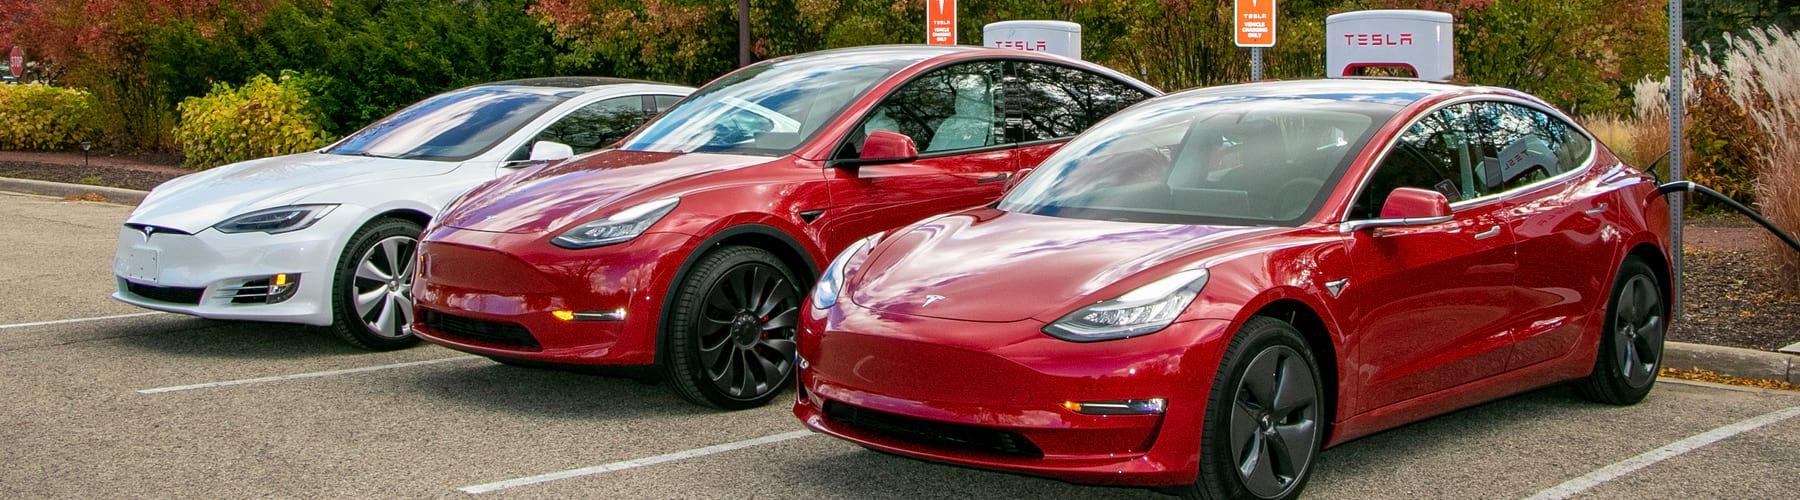 Three Tesla Cars Lined Up